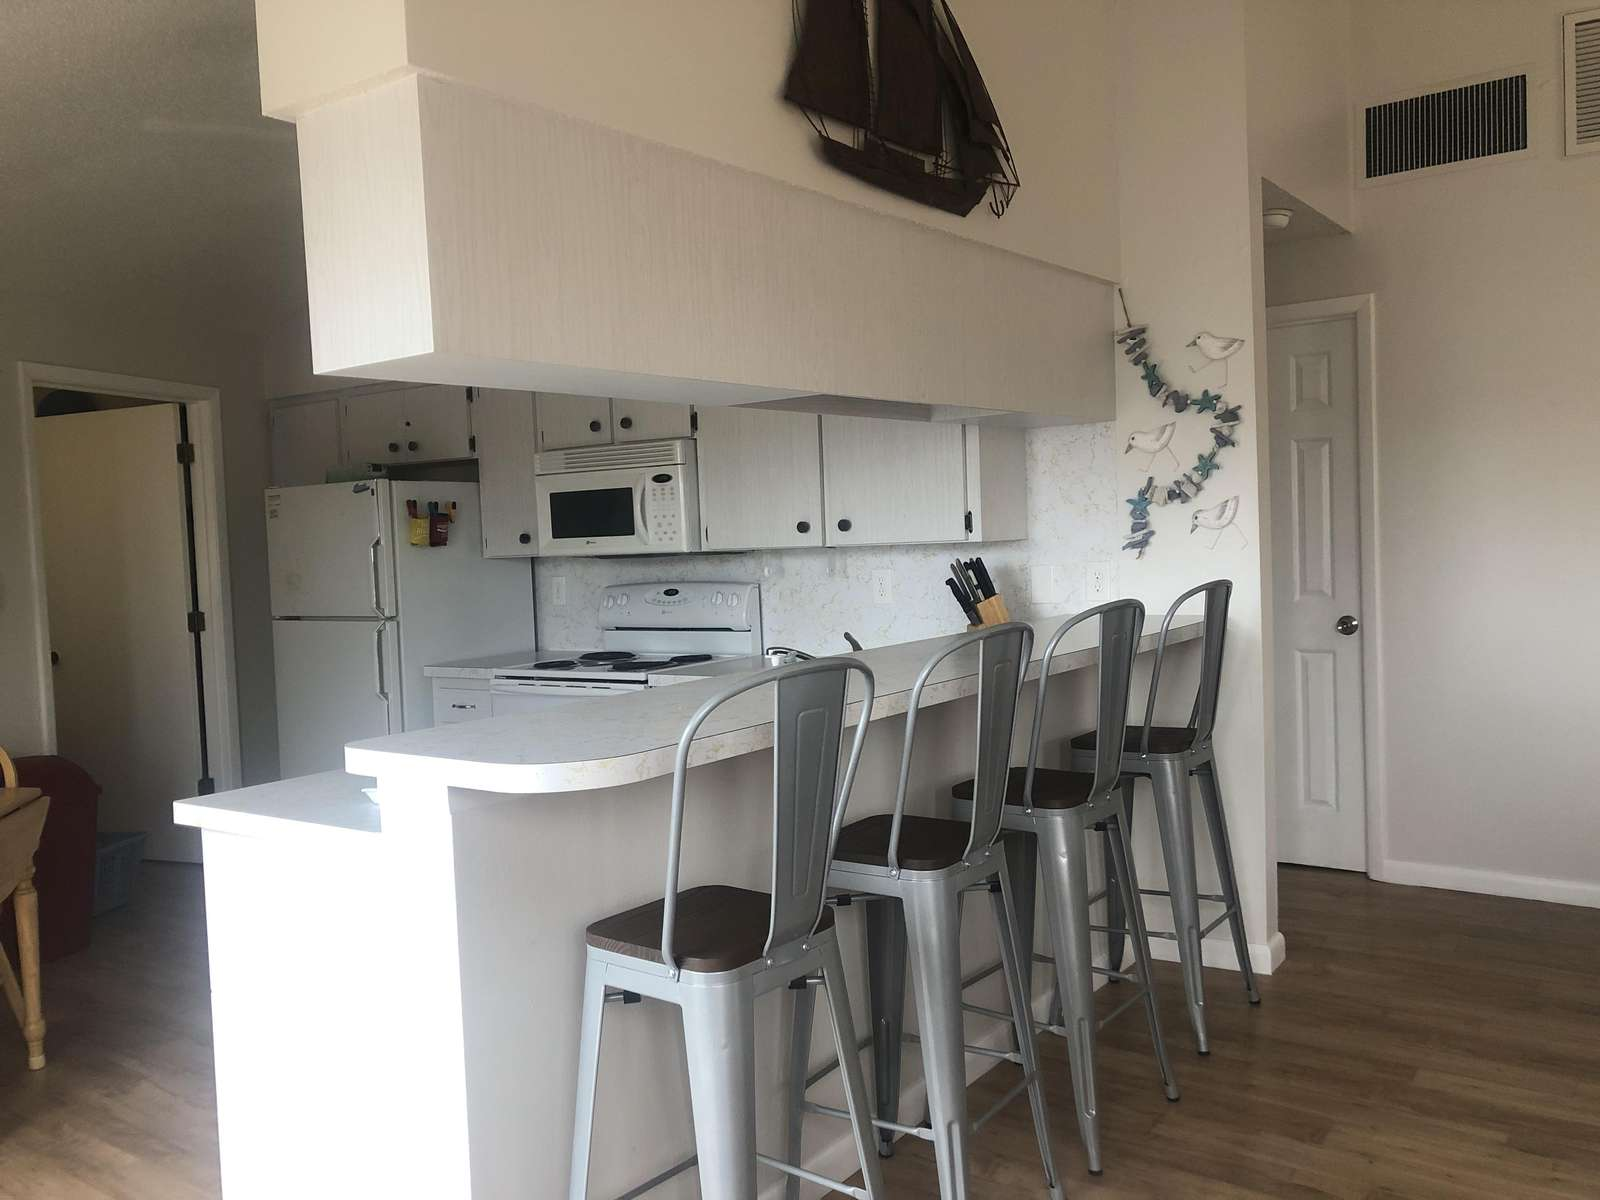 Kitchen - peninsula with bar stools